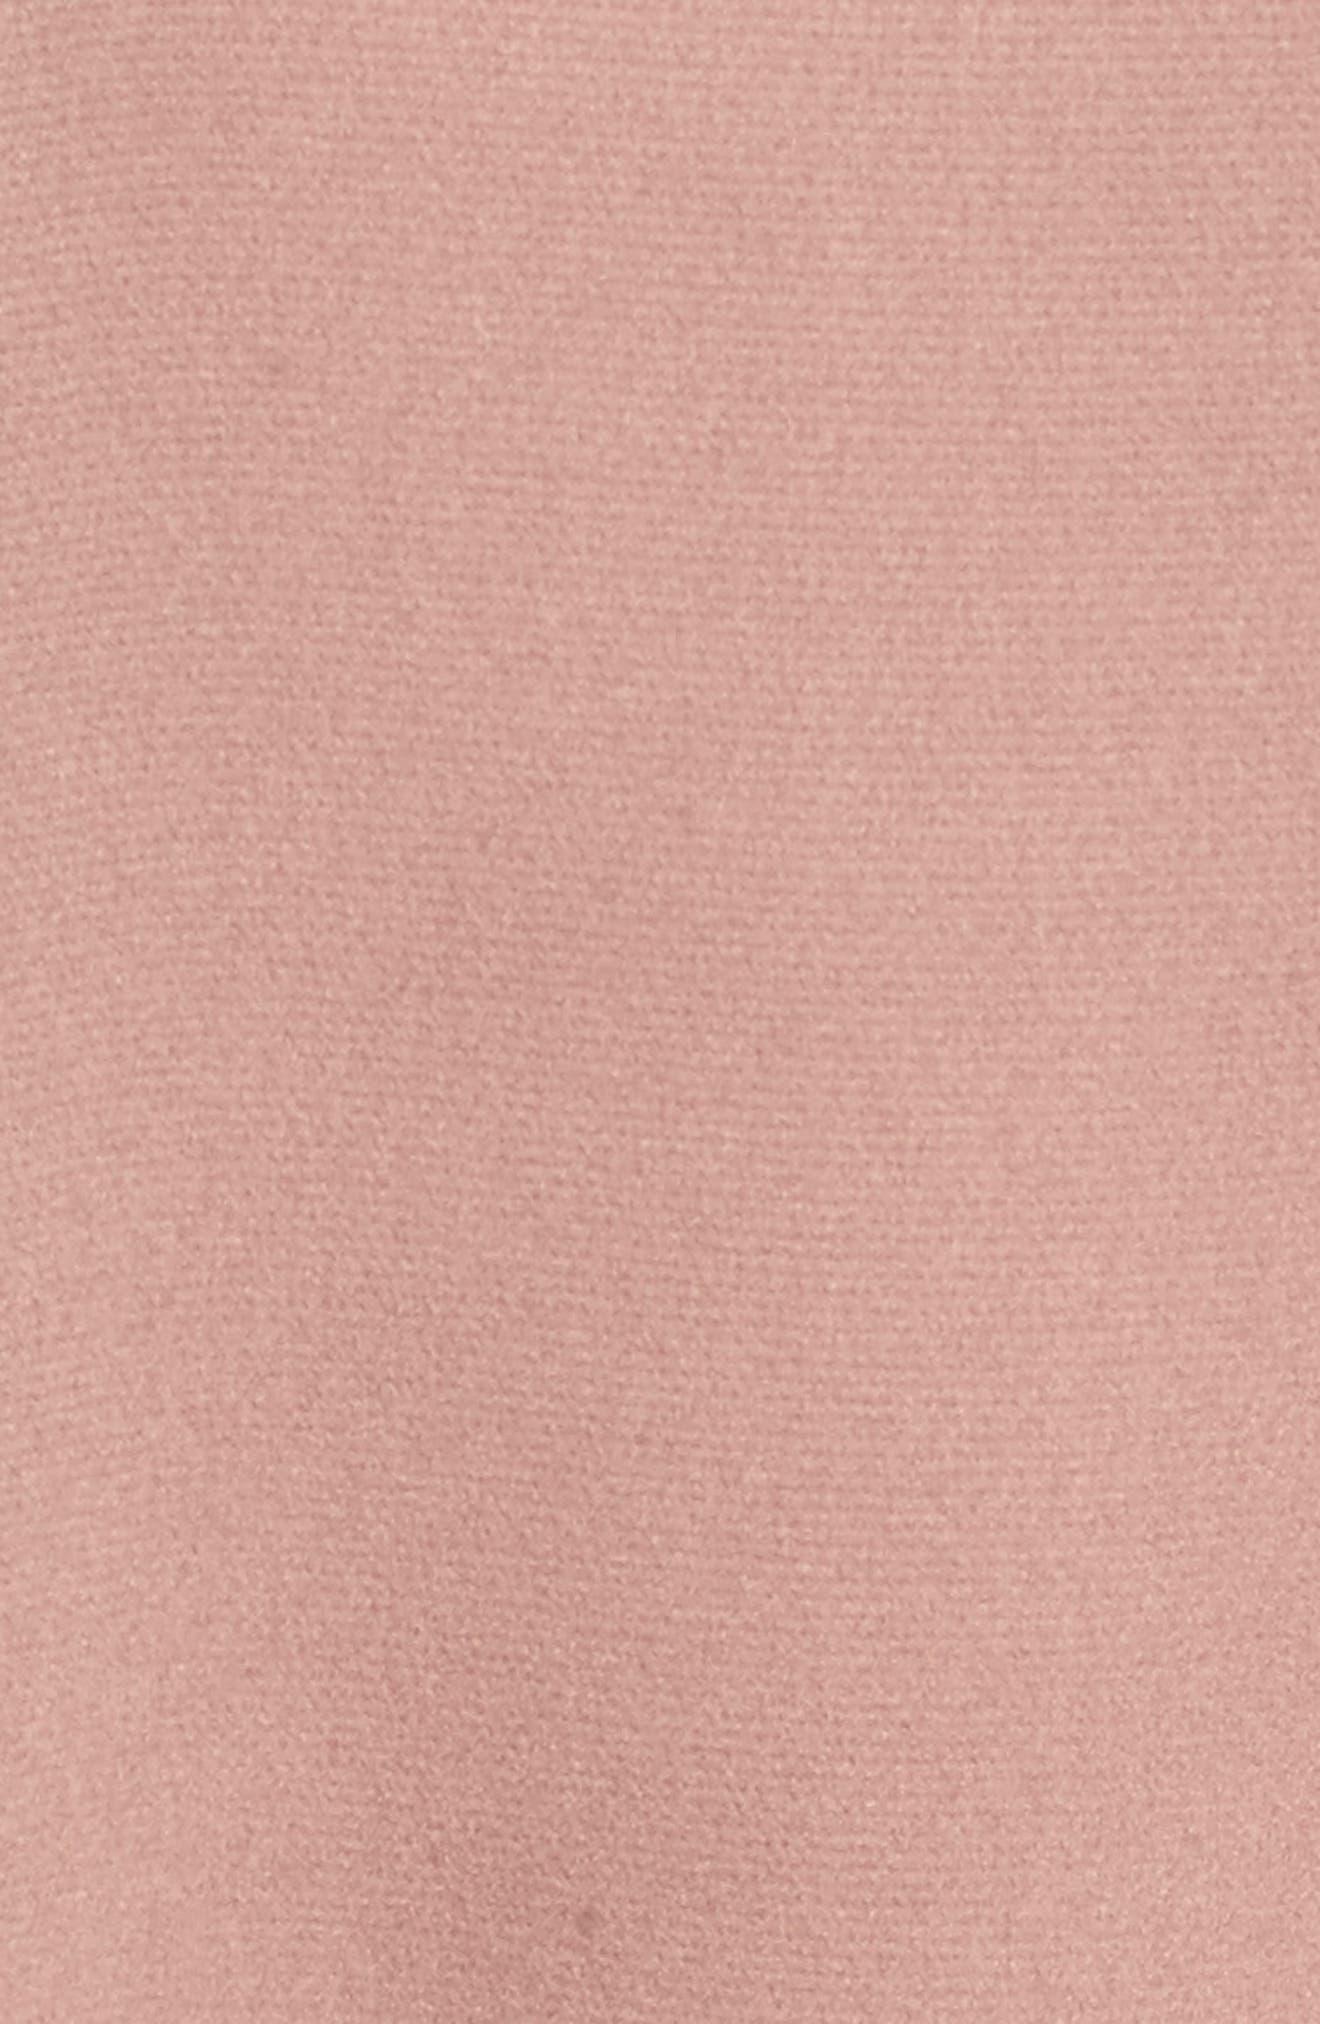 Ruffle Sleeve Satin Top,                             Alternate thumbnail 5, color,                             Mauve